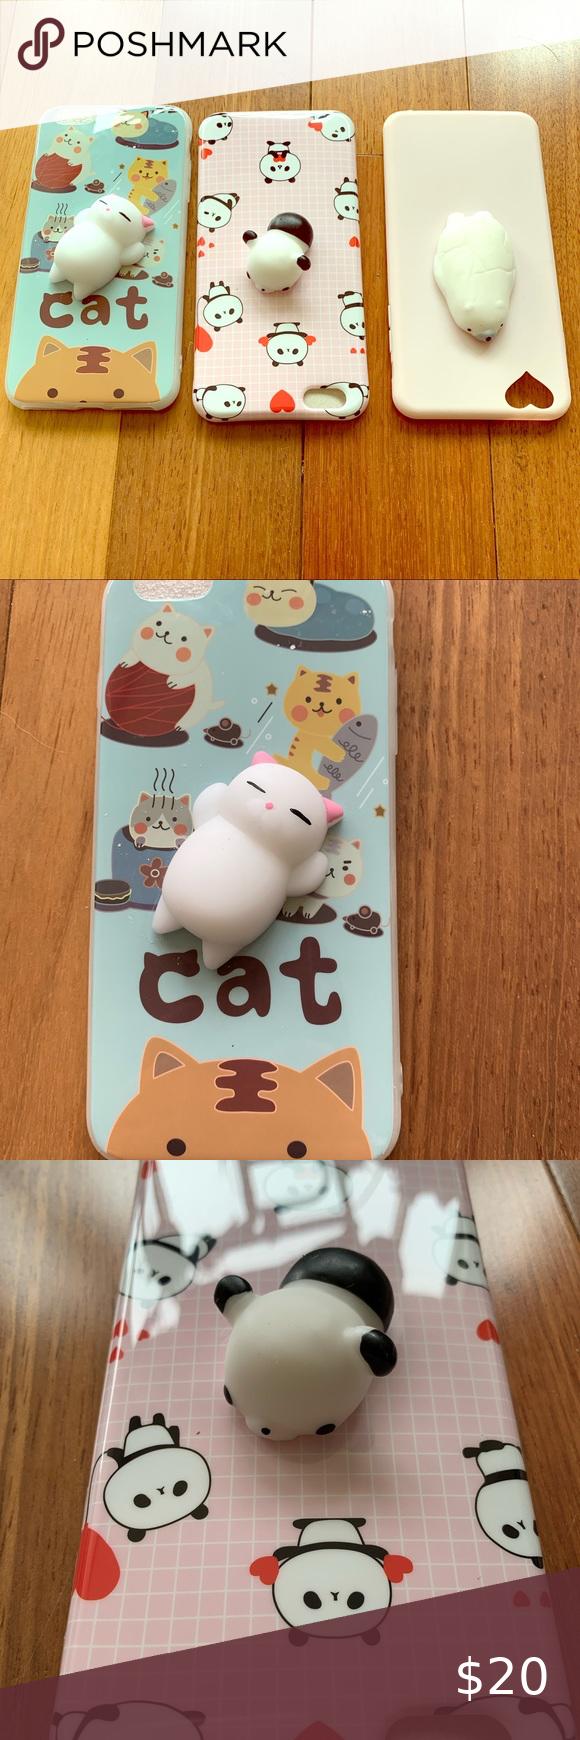 Iphone 6 Plus Cute Squishy Animal Case Set Of 3 In 2020 Iphone 6 Plus Iphone Iphone 6